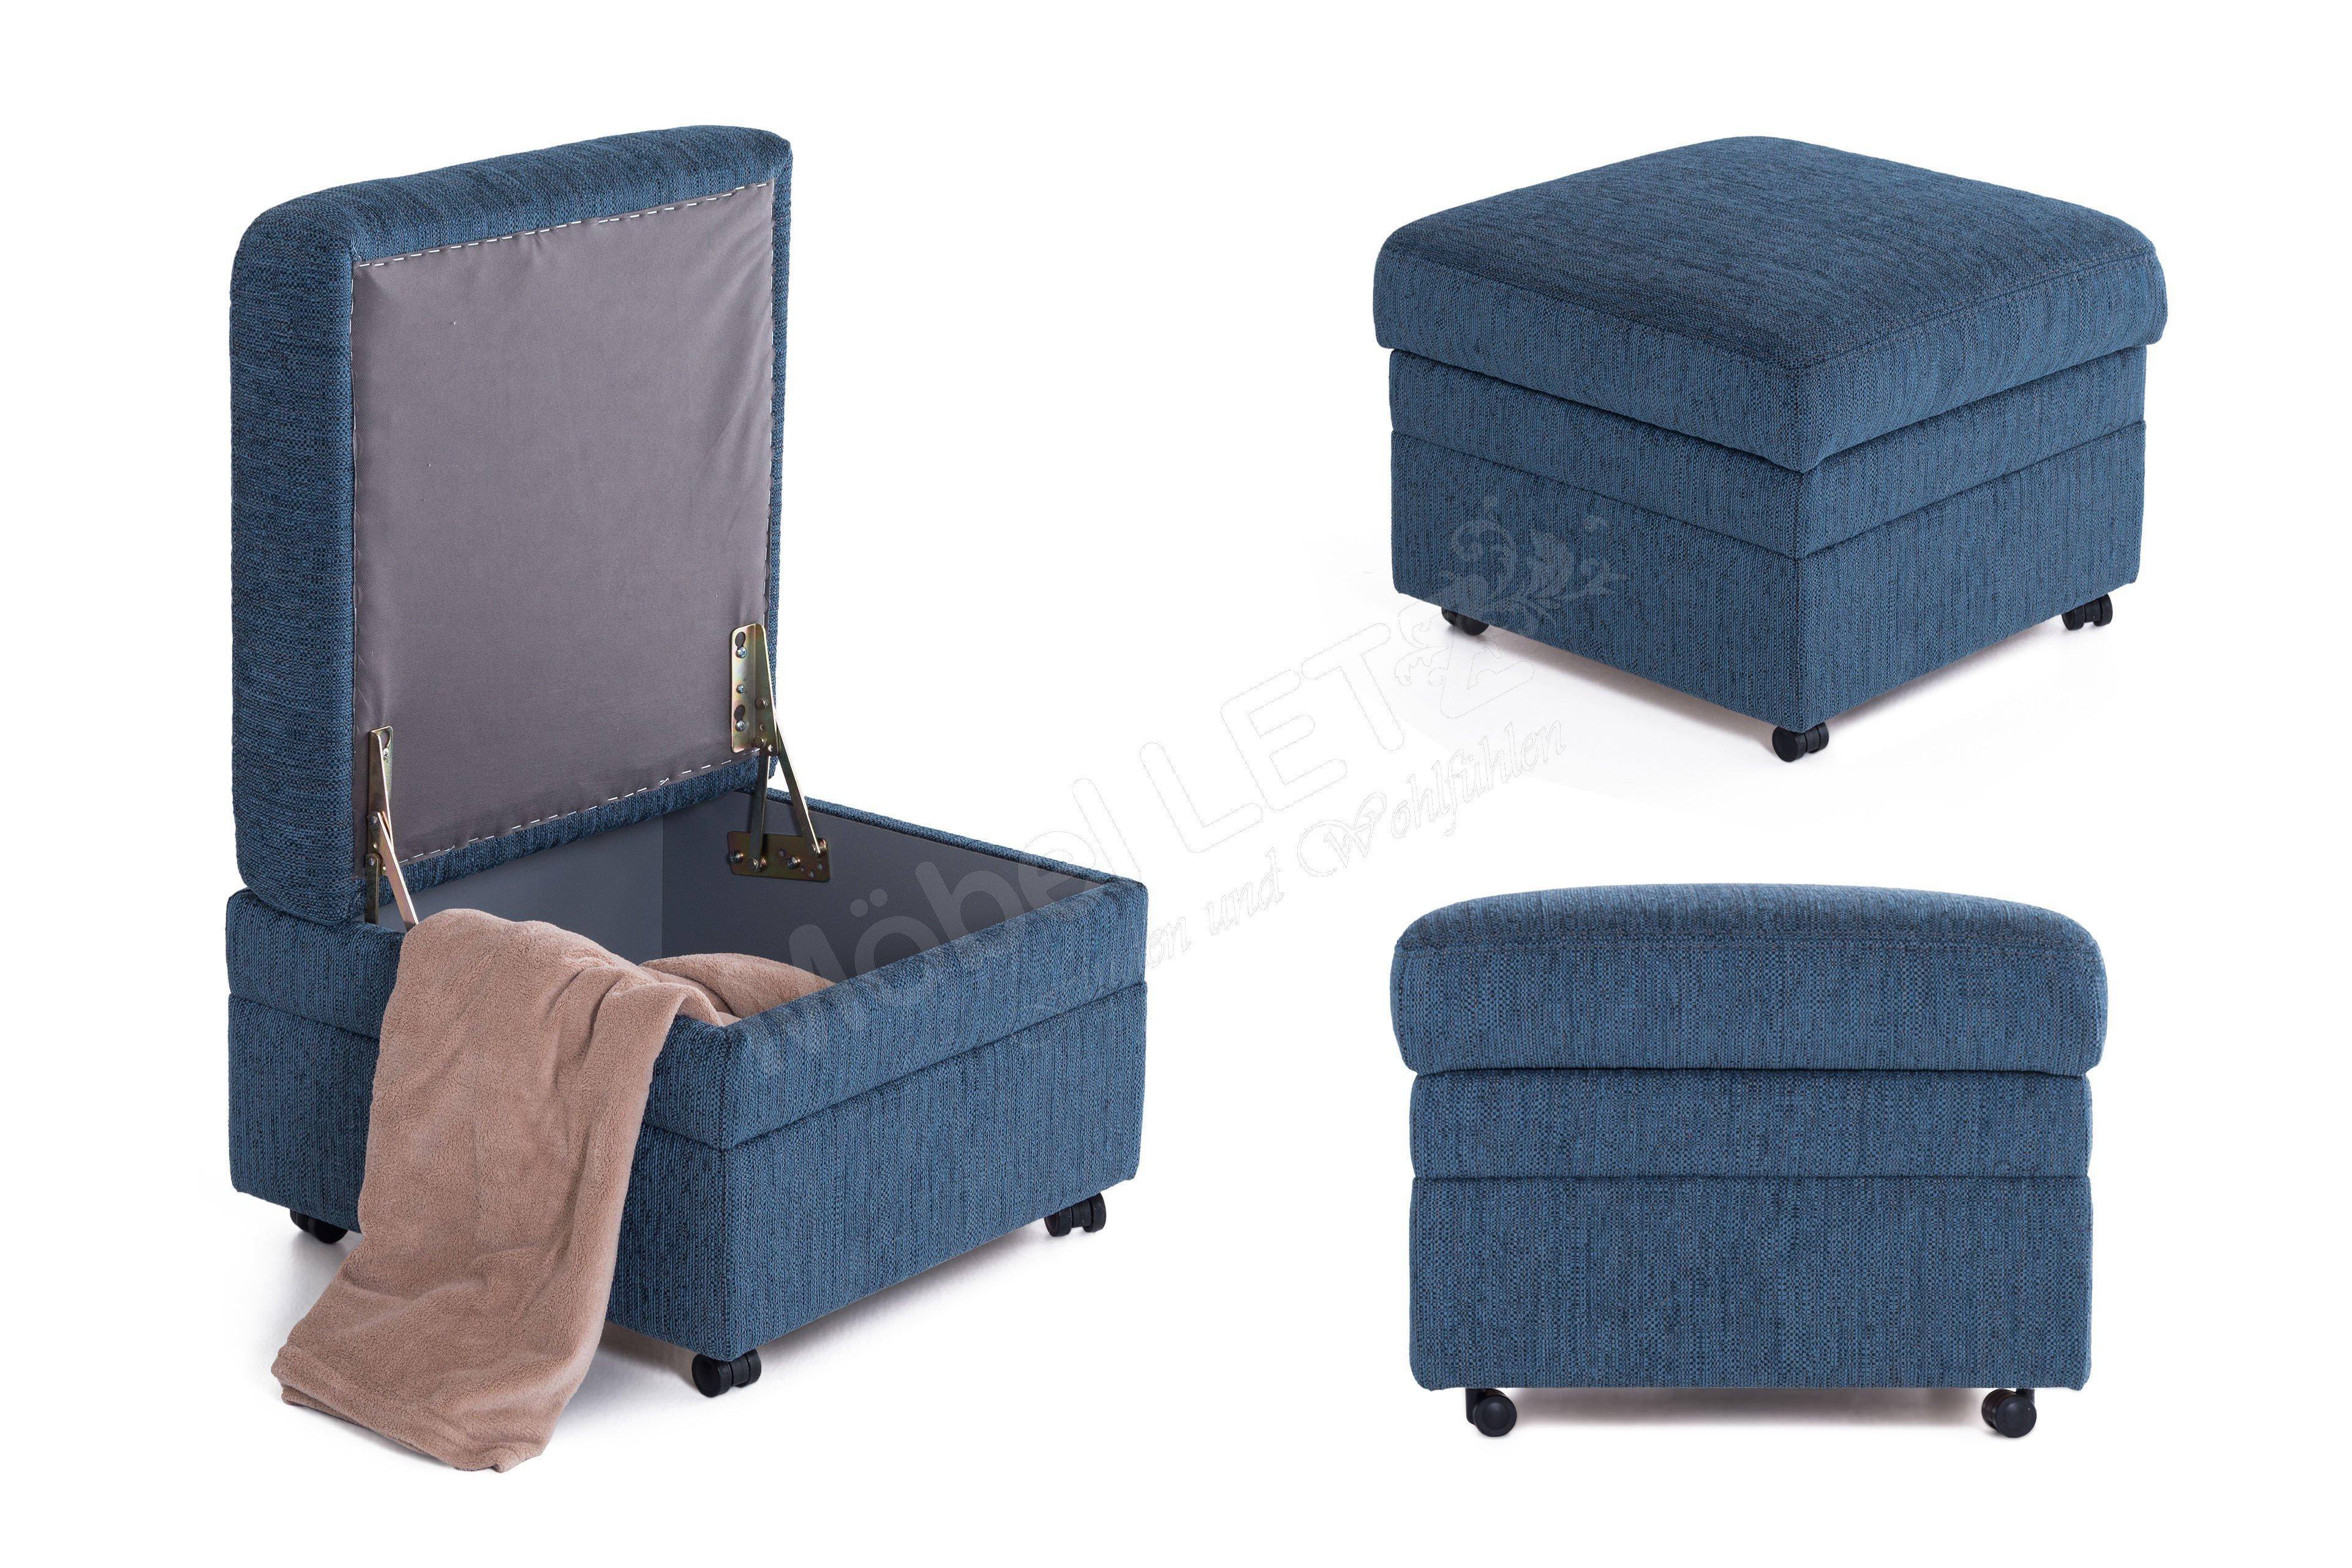 pm oelsa amica polstergarnitur in dunkelblau m bel letz. Black Bedroom Furniture Sets. Home Design Ideas